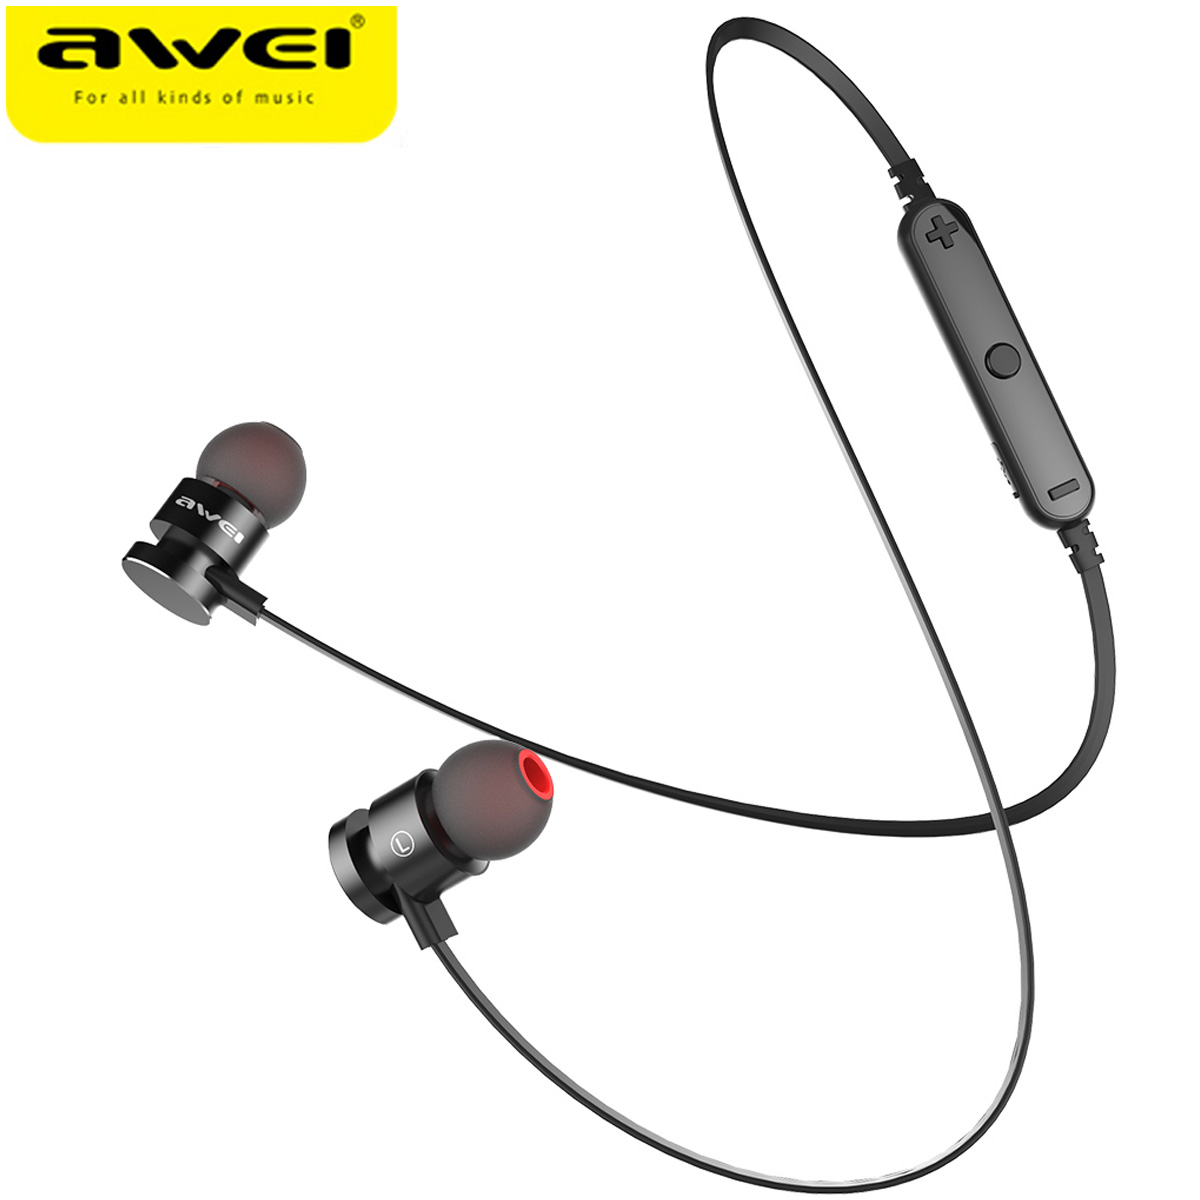 AWEI T11 Cuffia Senza Fili Auricolare Bluetooth Fone de ouvido Per Il Telefono Kulakl k Neckband Écouteur Cuffie Bluetooth V4.2